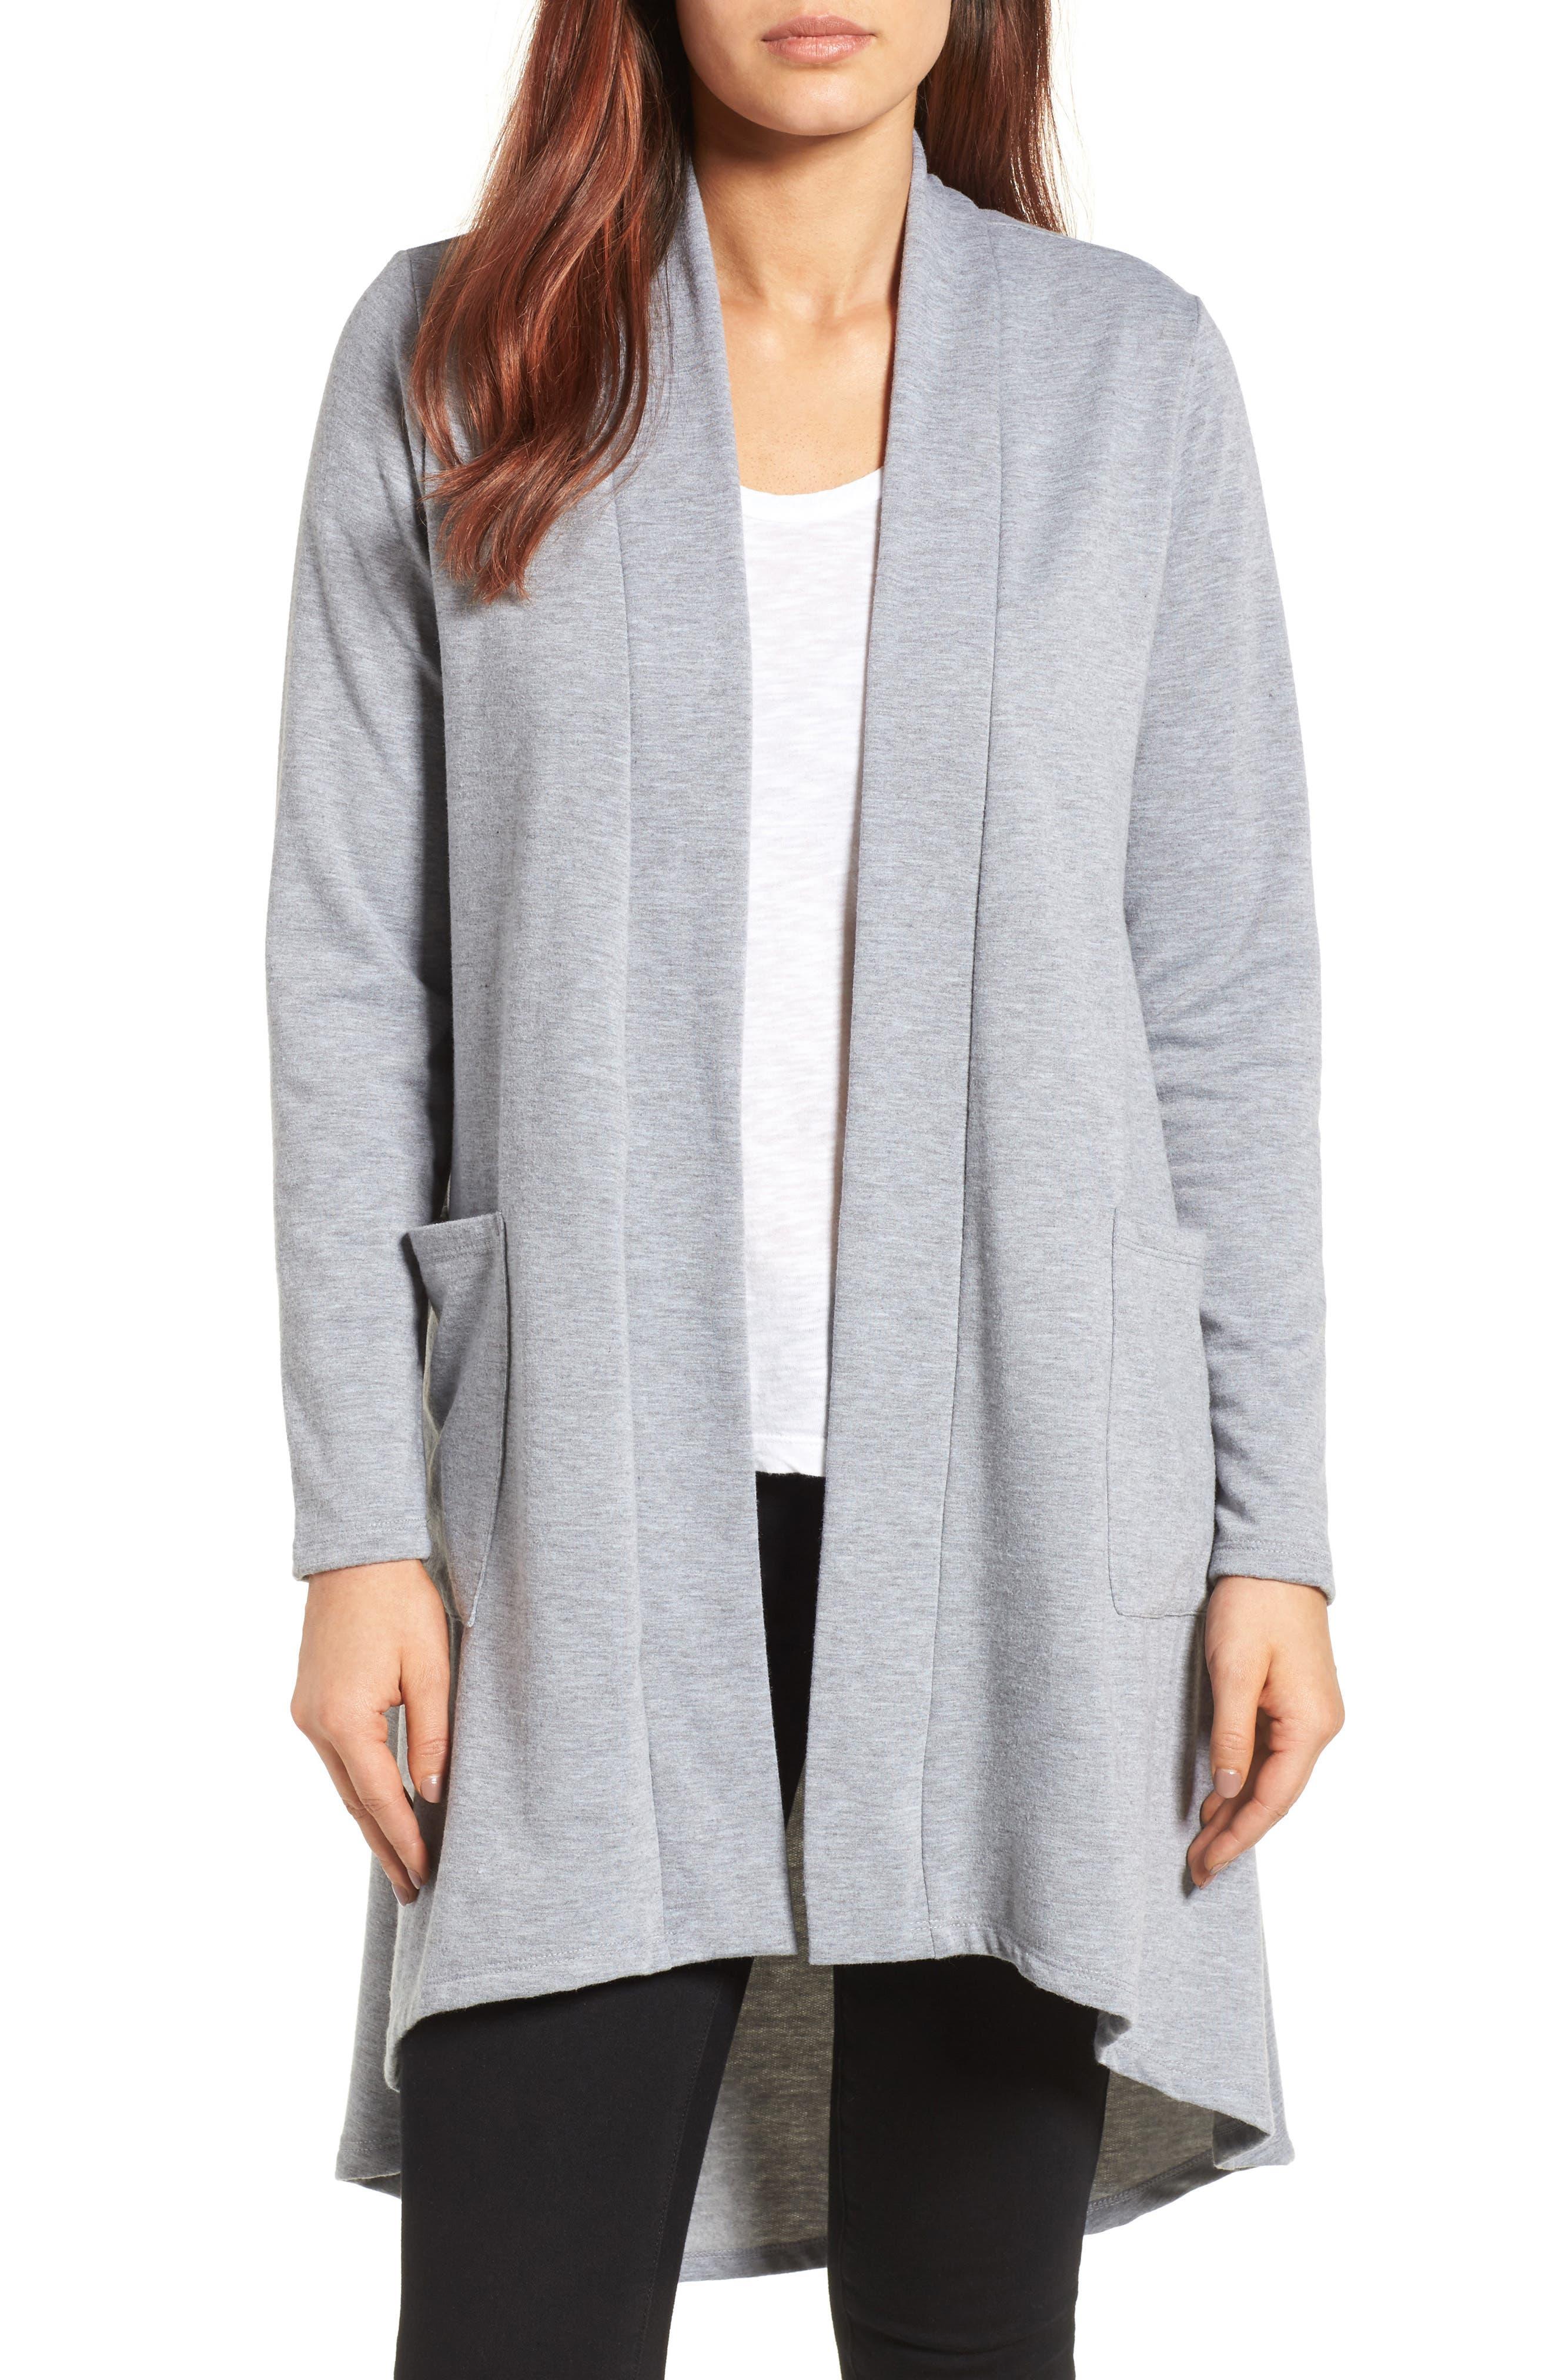 Main Image - Bobeau High/Low Fleece Knit Cardigan (Regular & Petite)